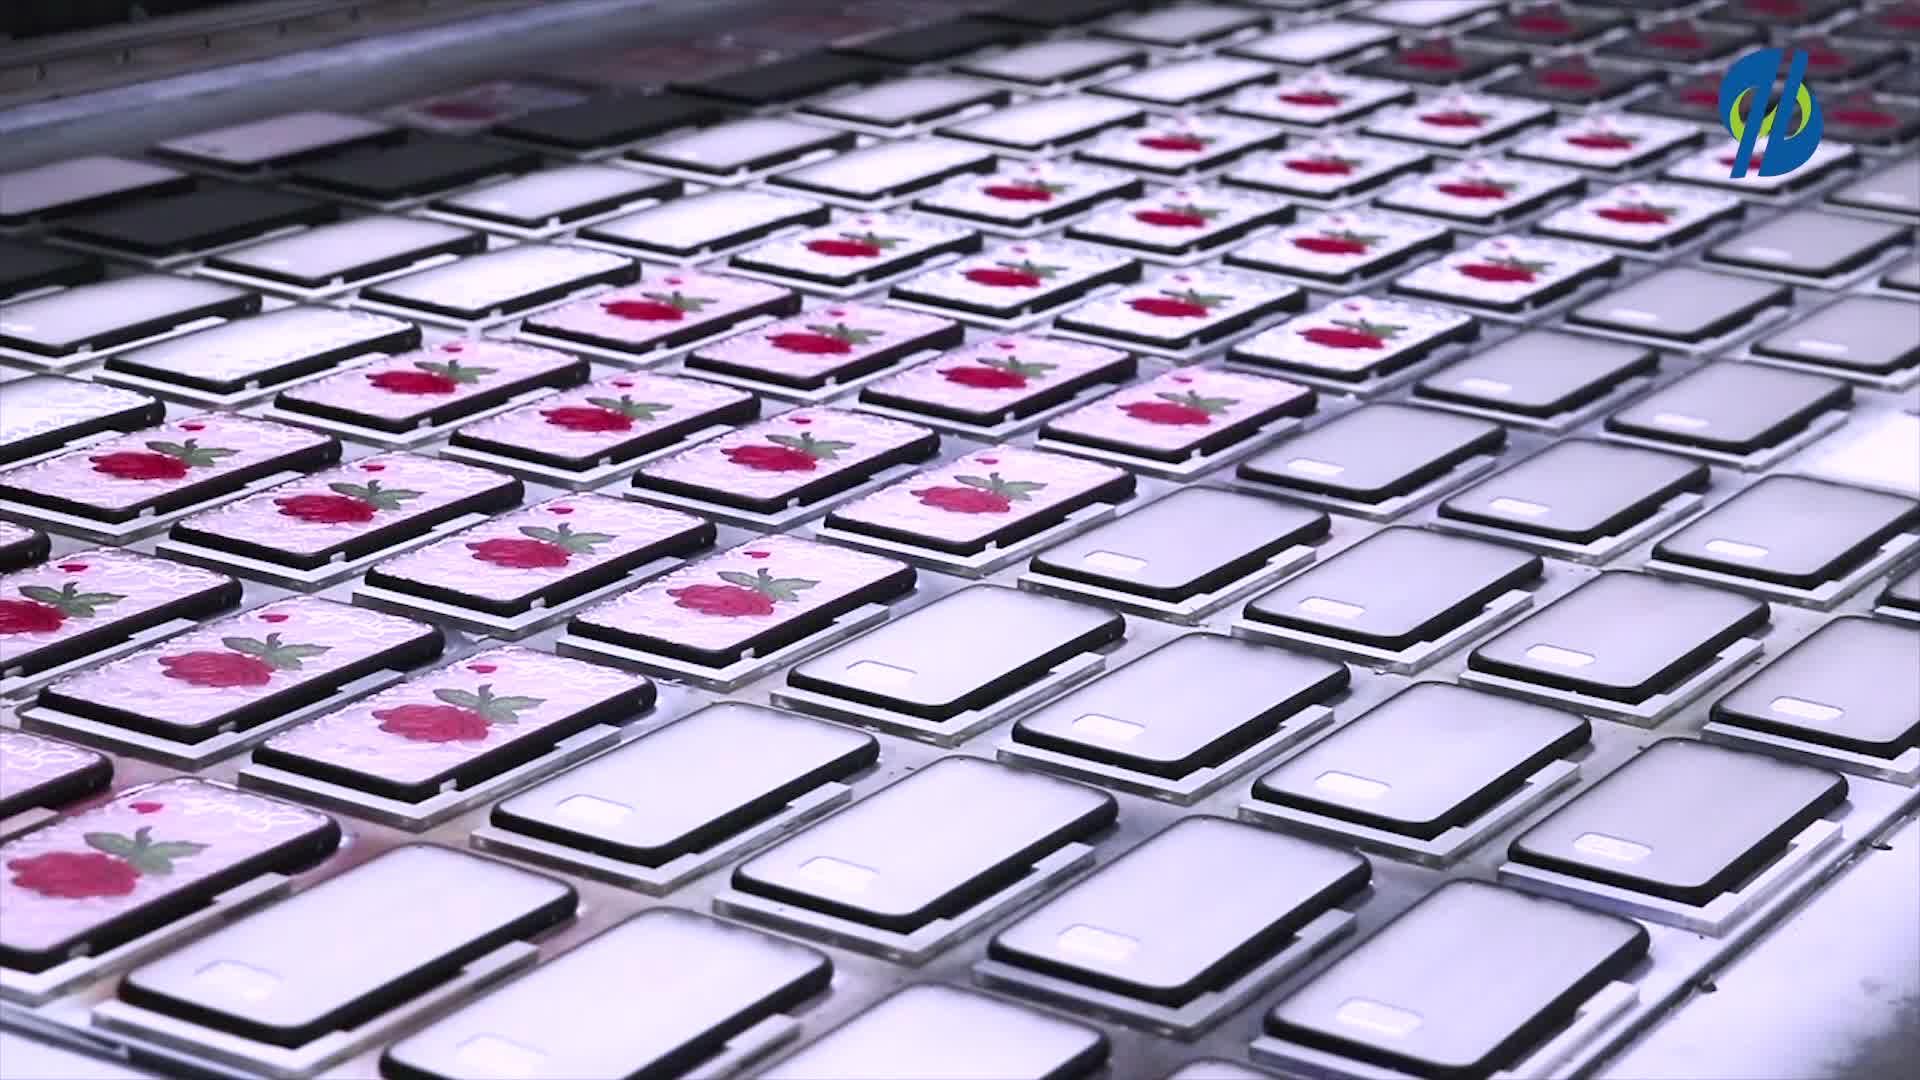 2018 Produttore Ultra Sottile Sottile Opaca Cassa Del Telefono Morbida per Huawei Nova 3i